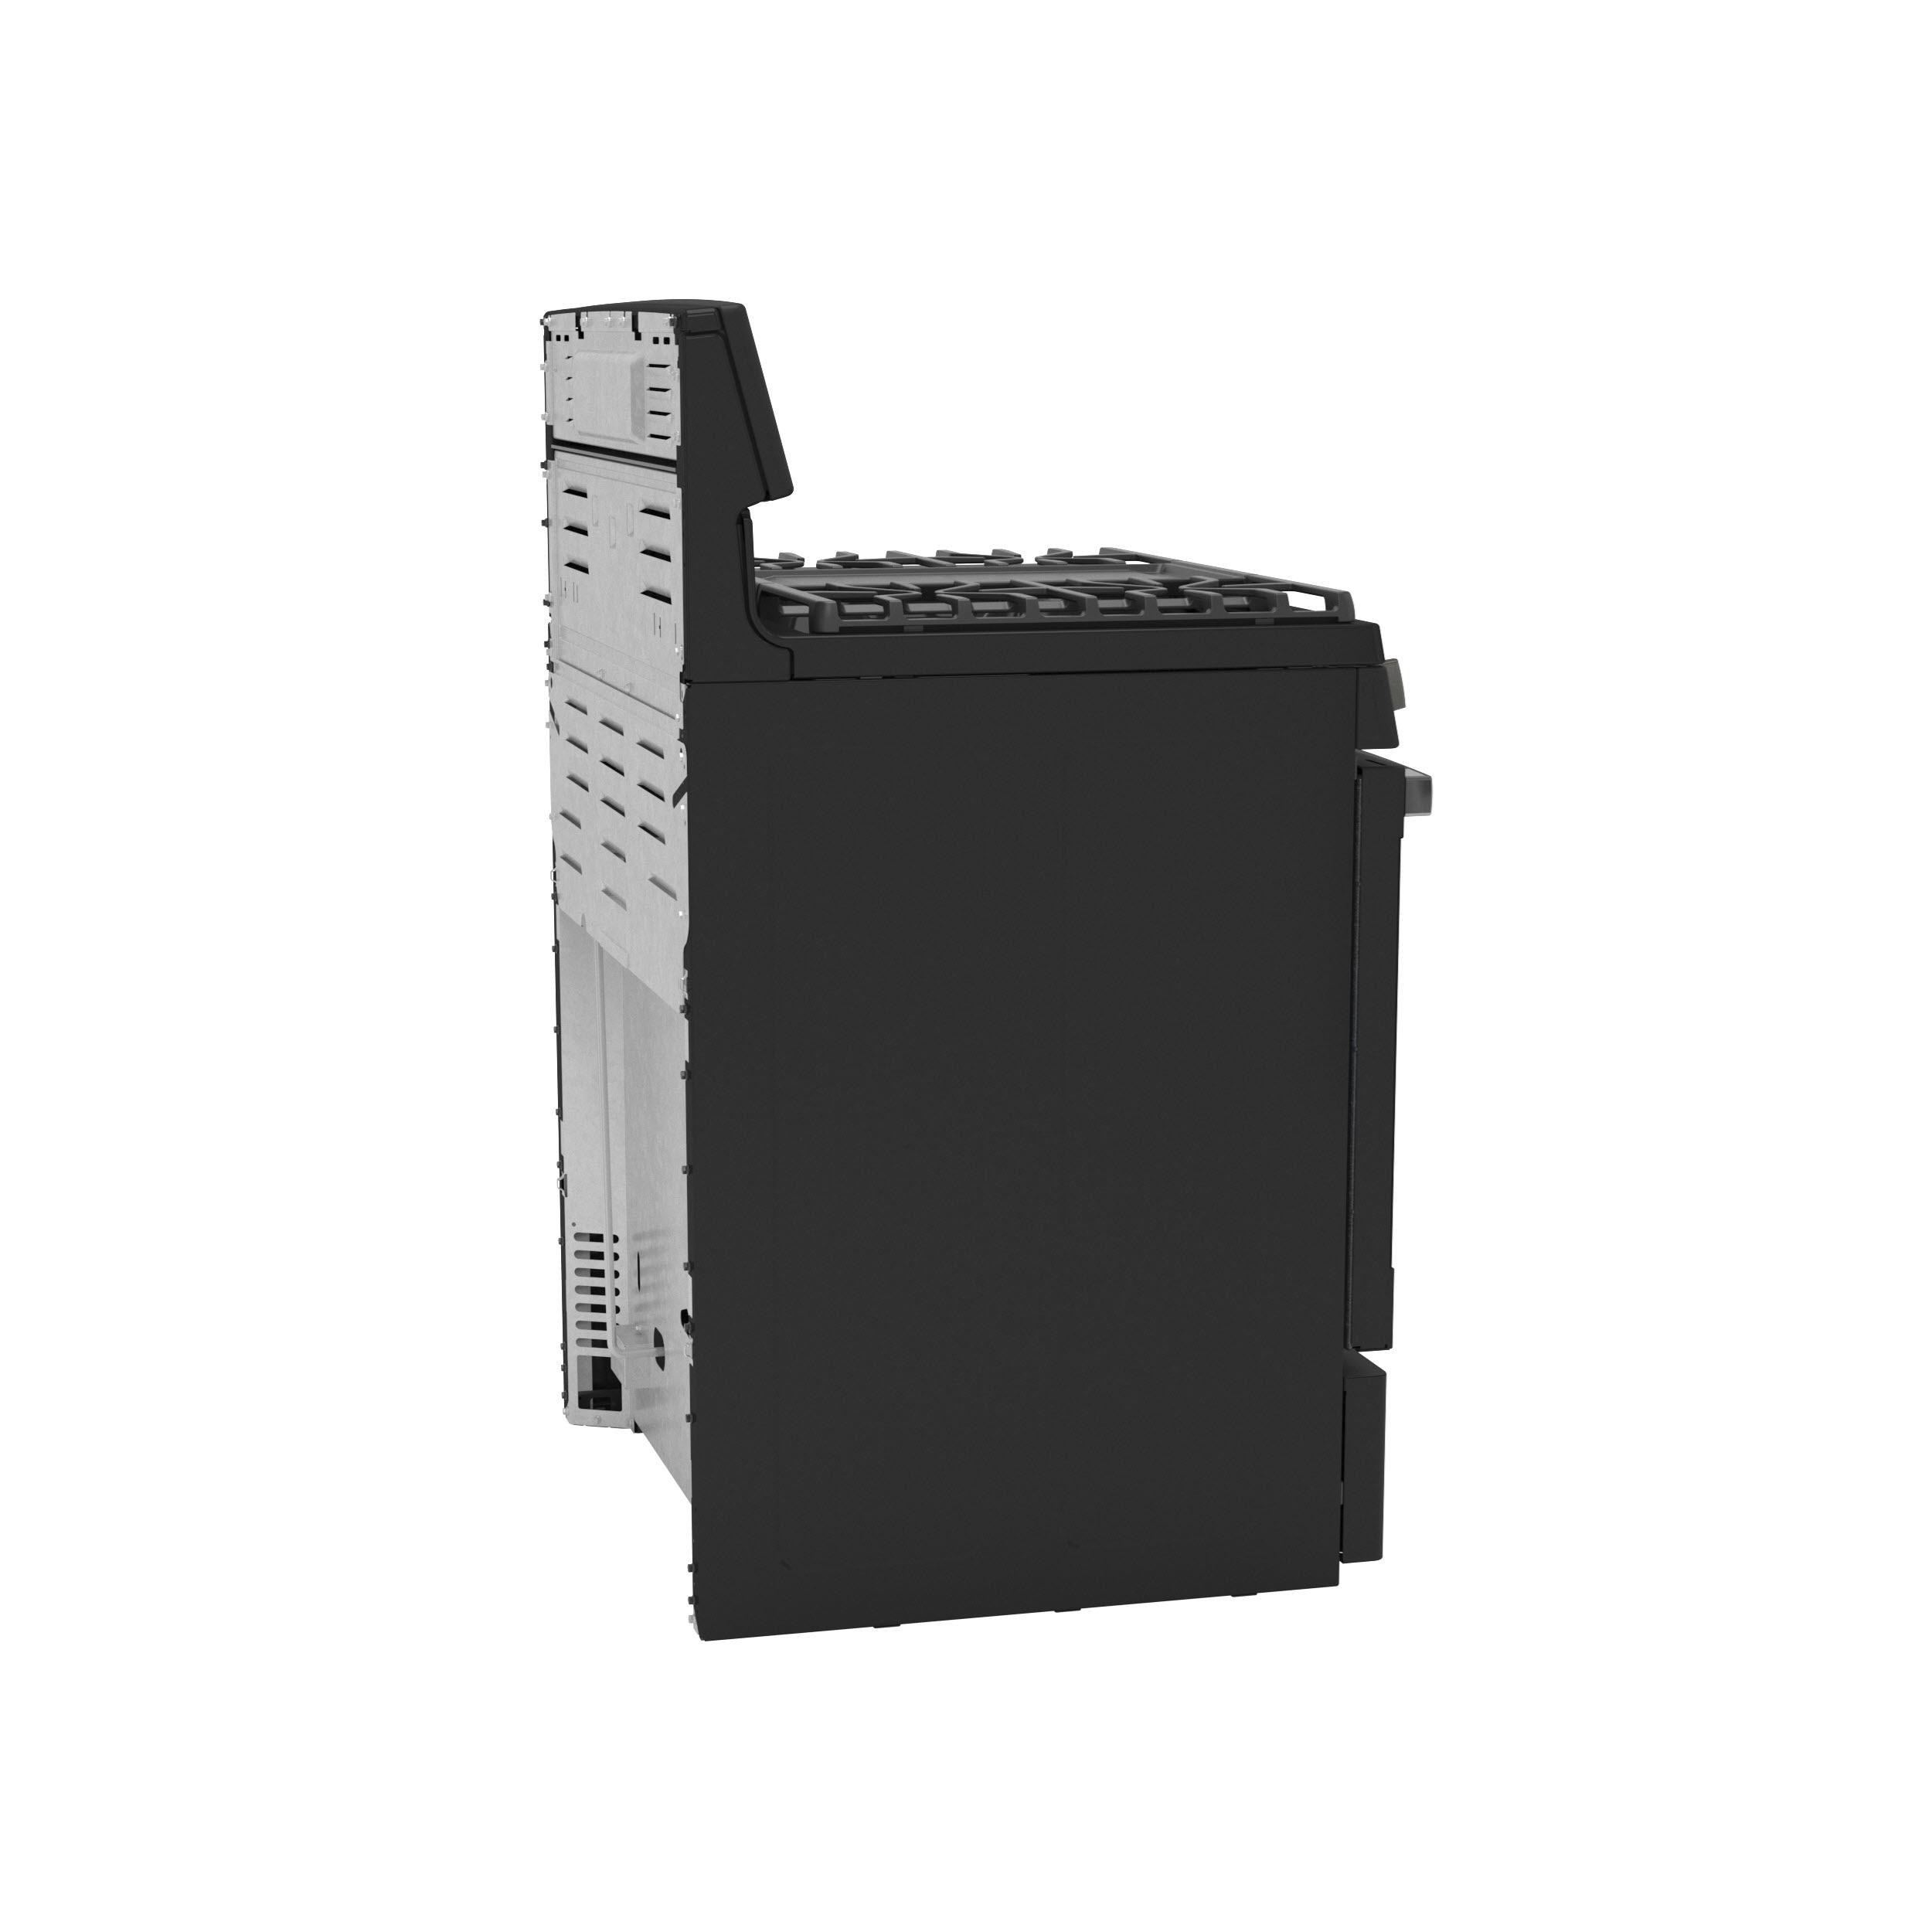 "Model: JGB660FPDS   GE GE® 30"" Free-Standing Gas Range"